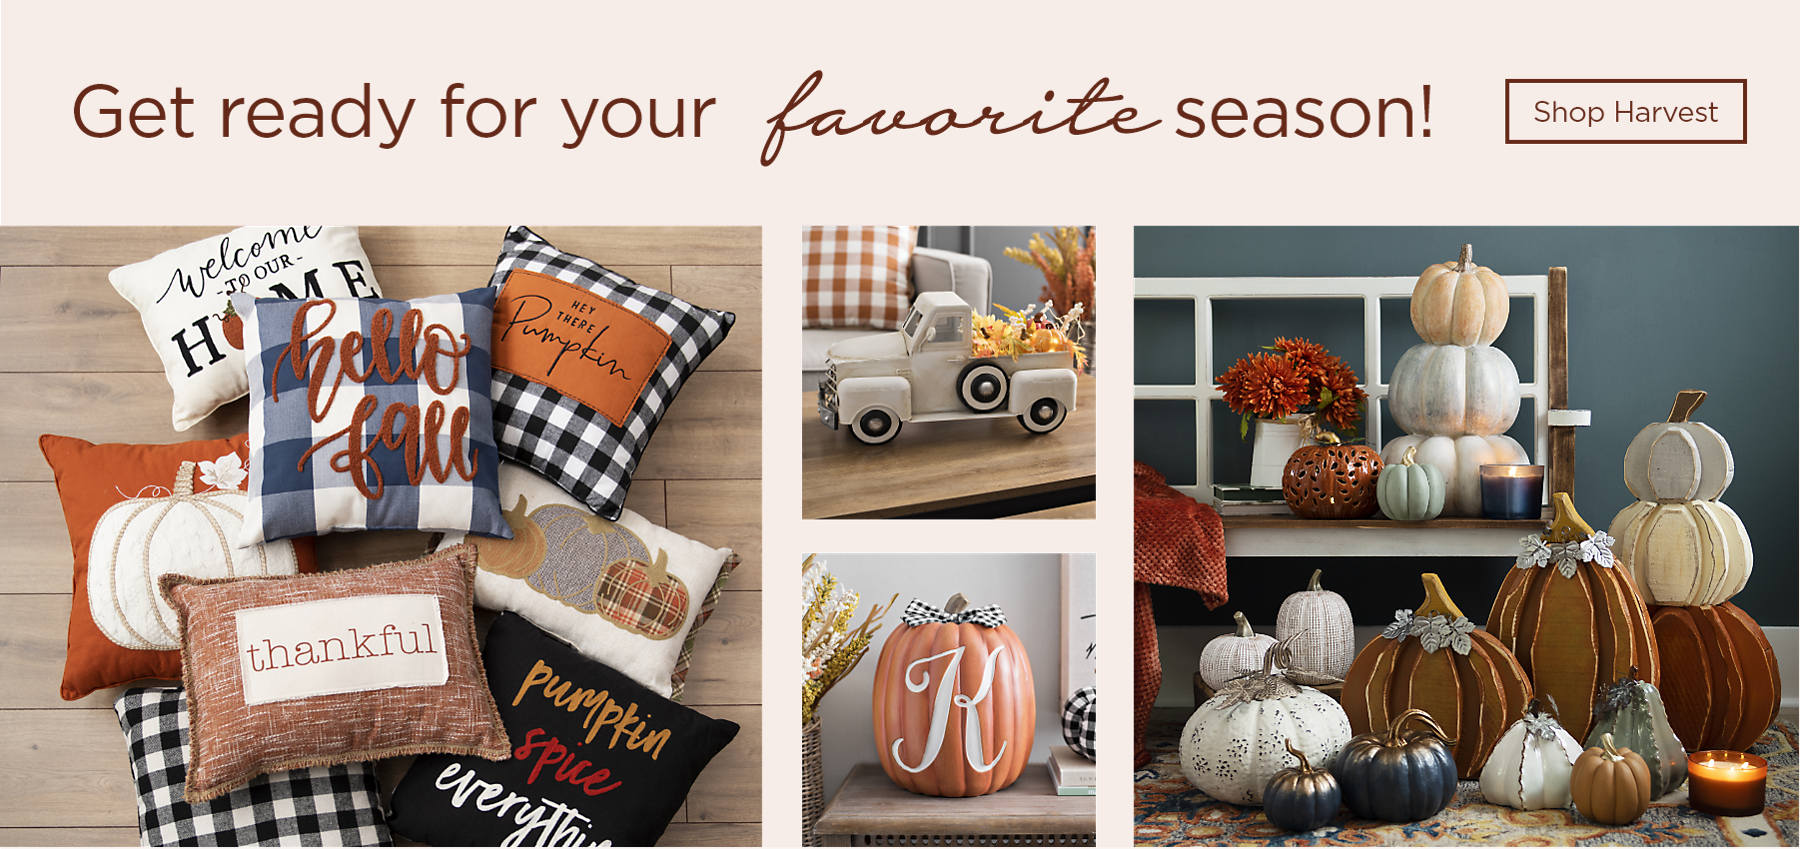 Get ready for your favorite season Shop Harvest